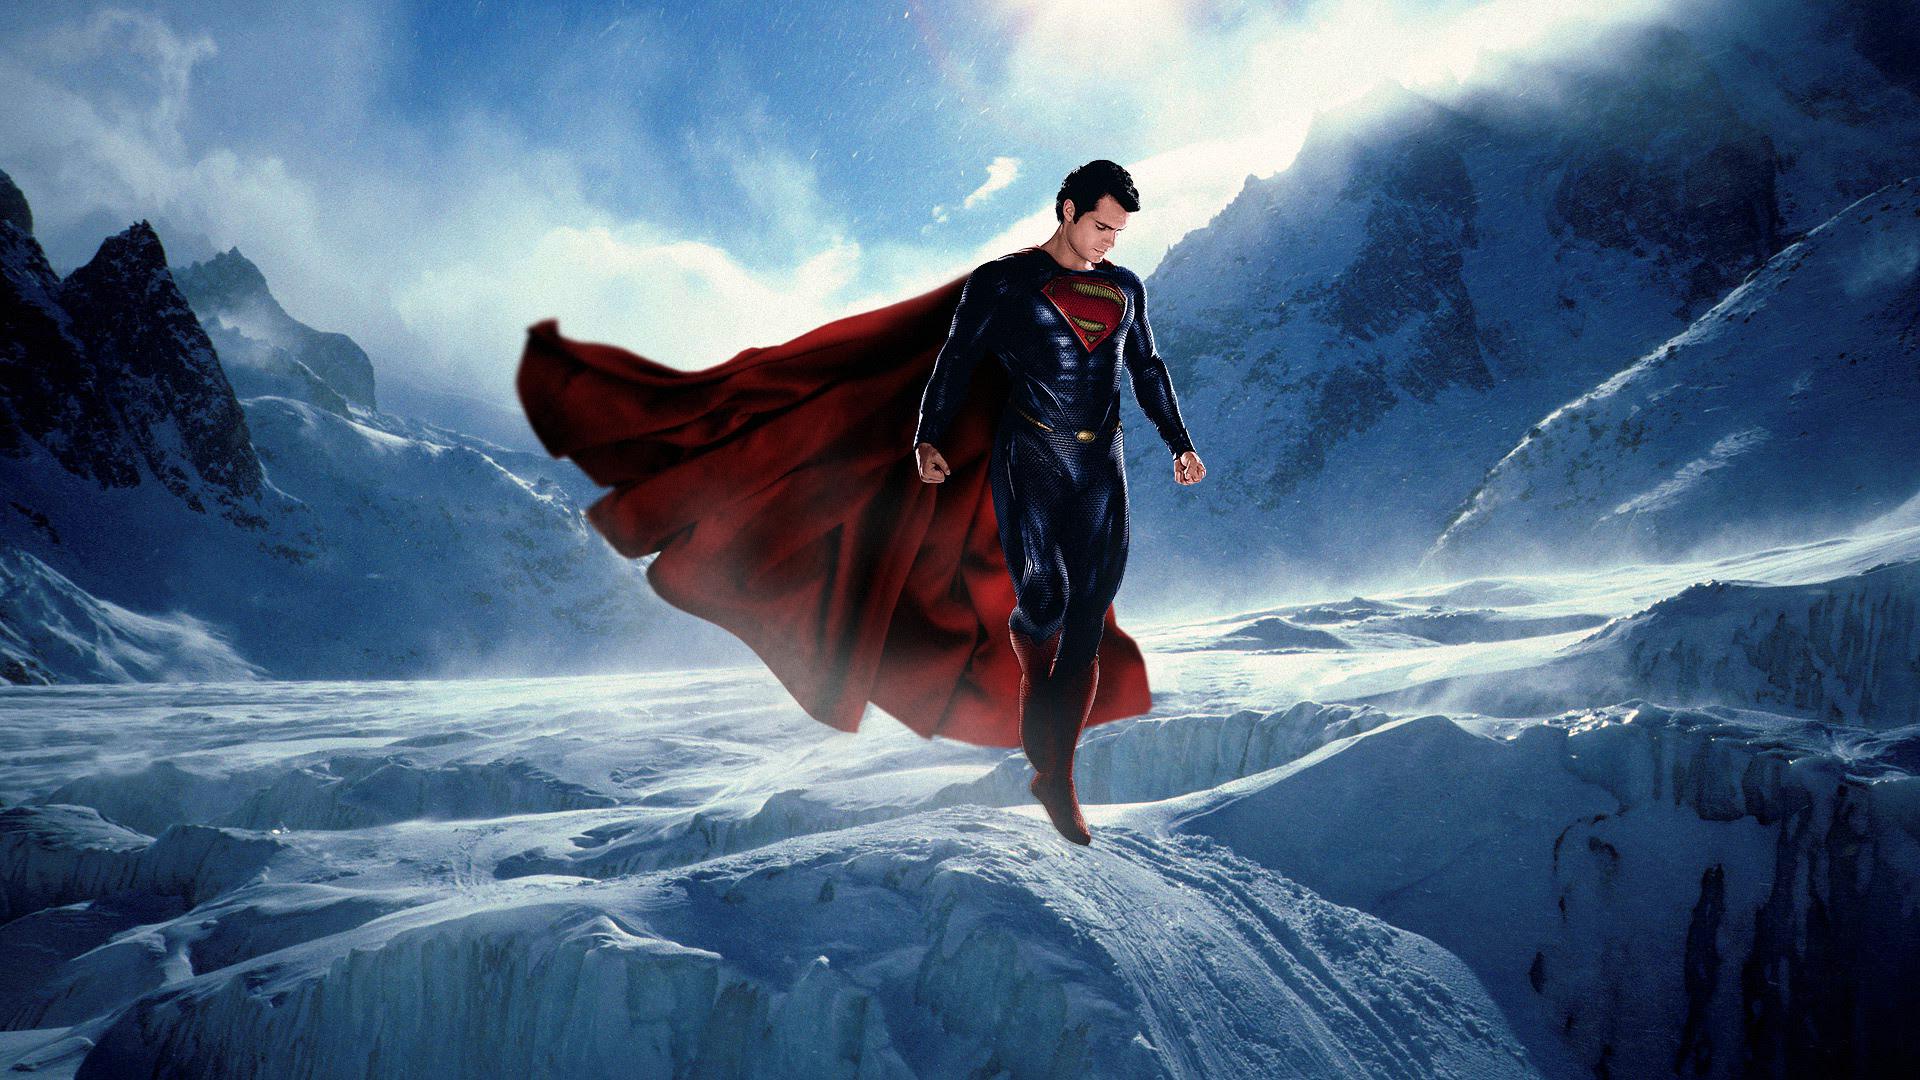 Superman Flying Wallpaper 66 Images